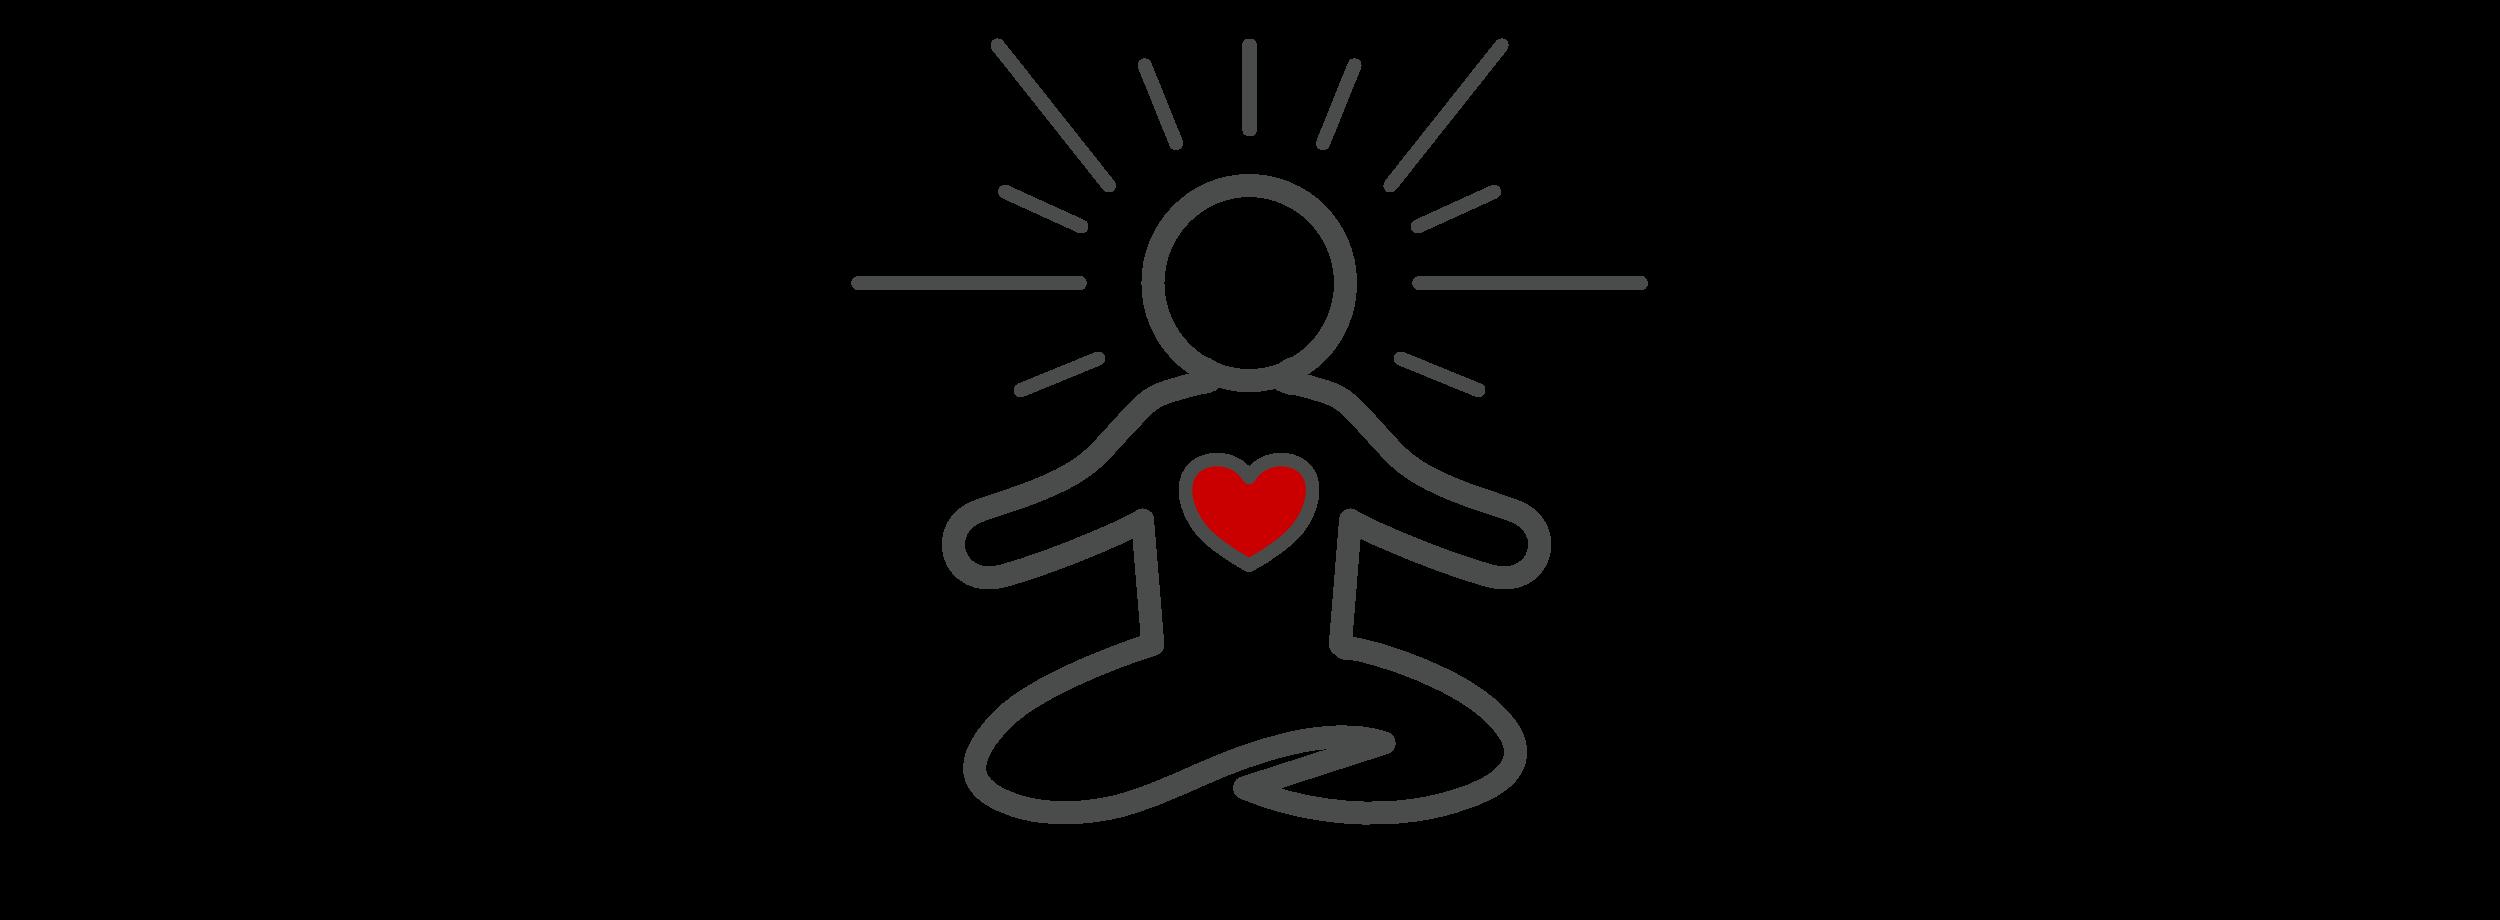 méditation éveil spirituel guidé